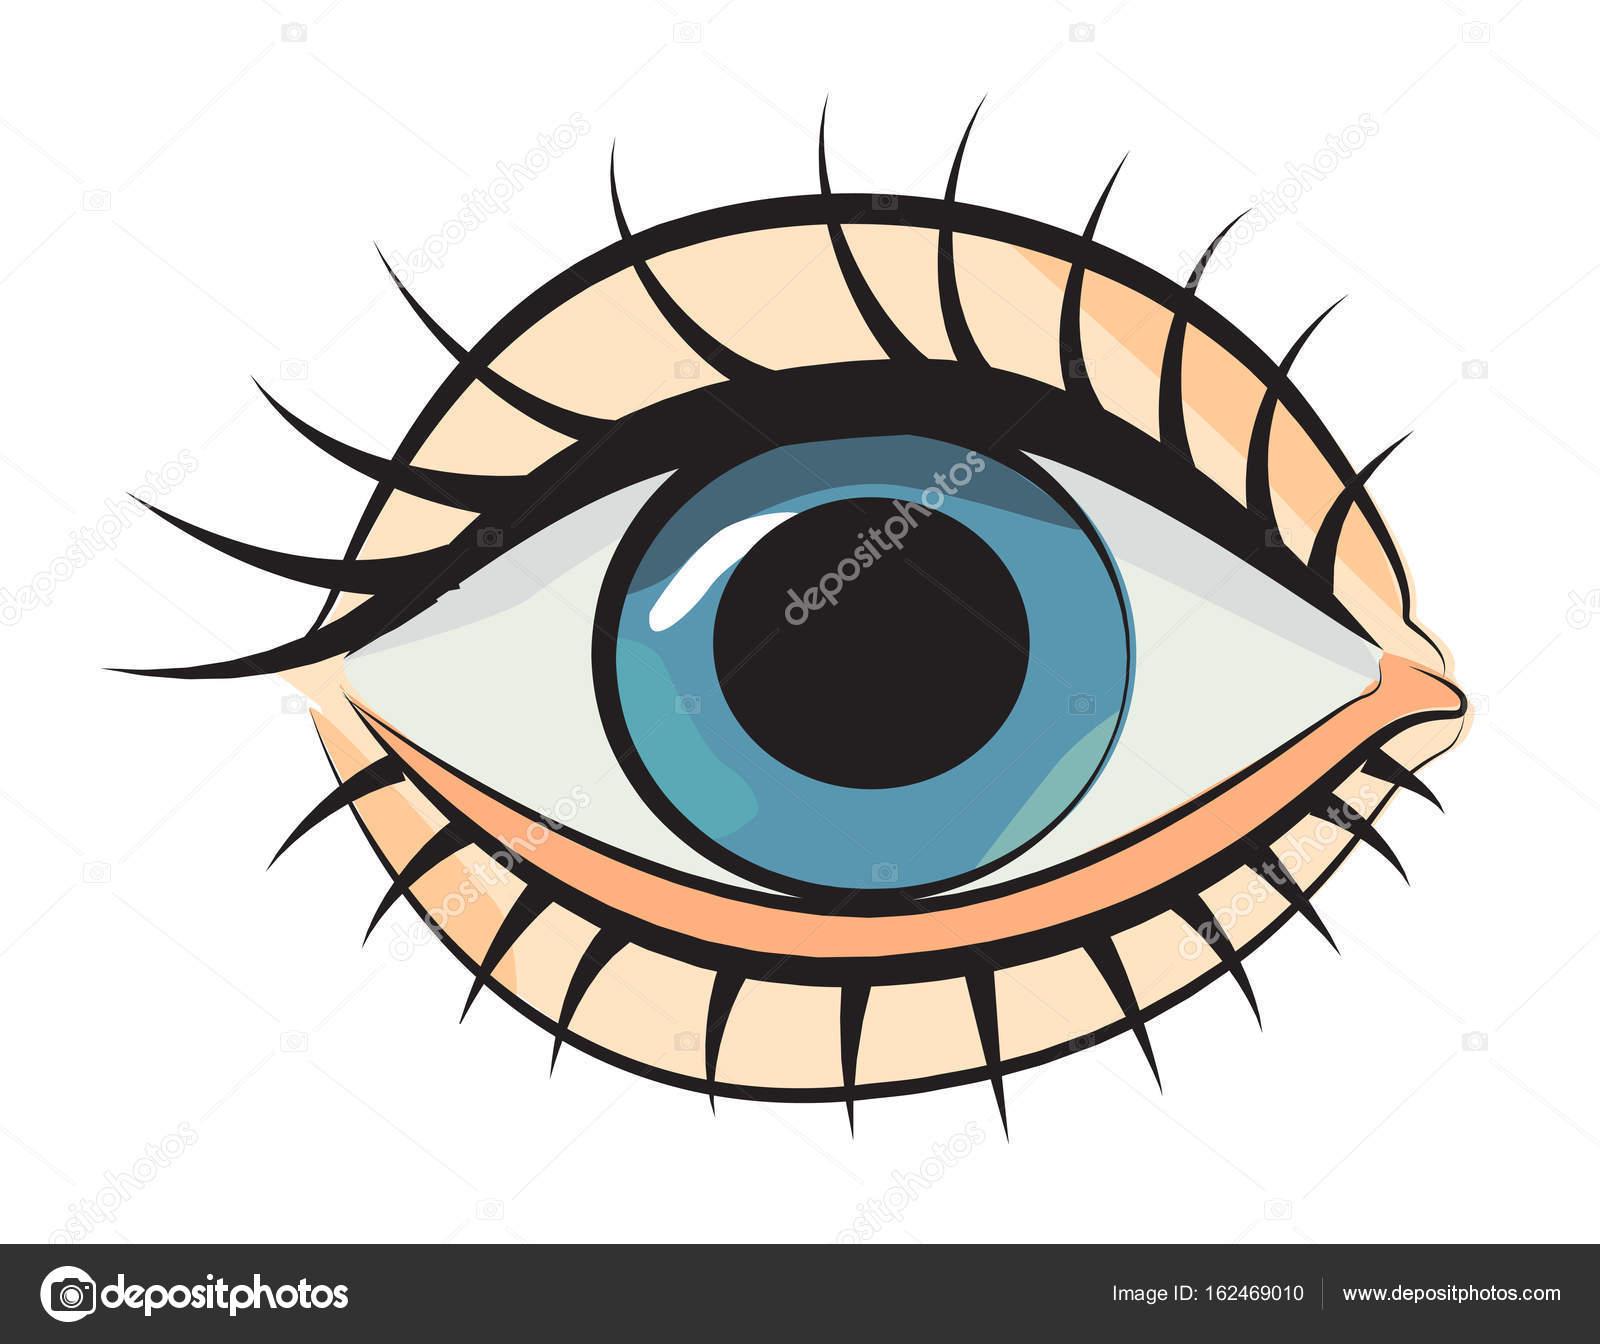 Ojo para caricatura caricatura de ojo vector de stock - Oeil a colorier ...